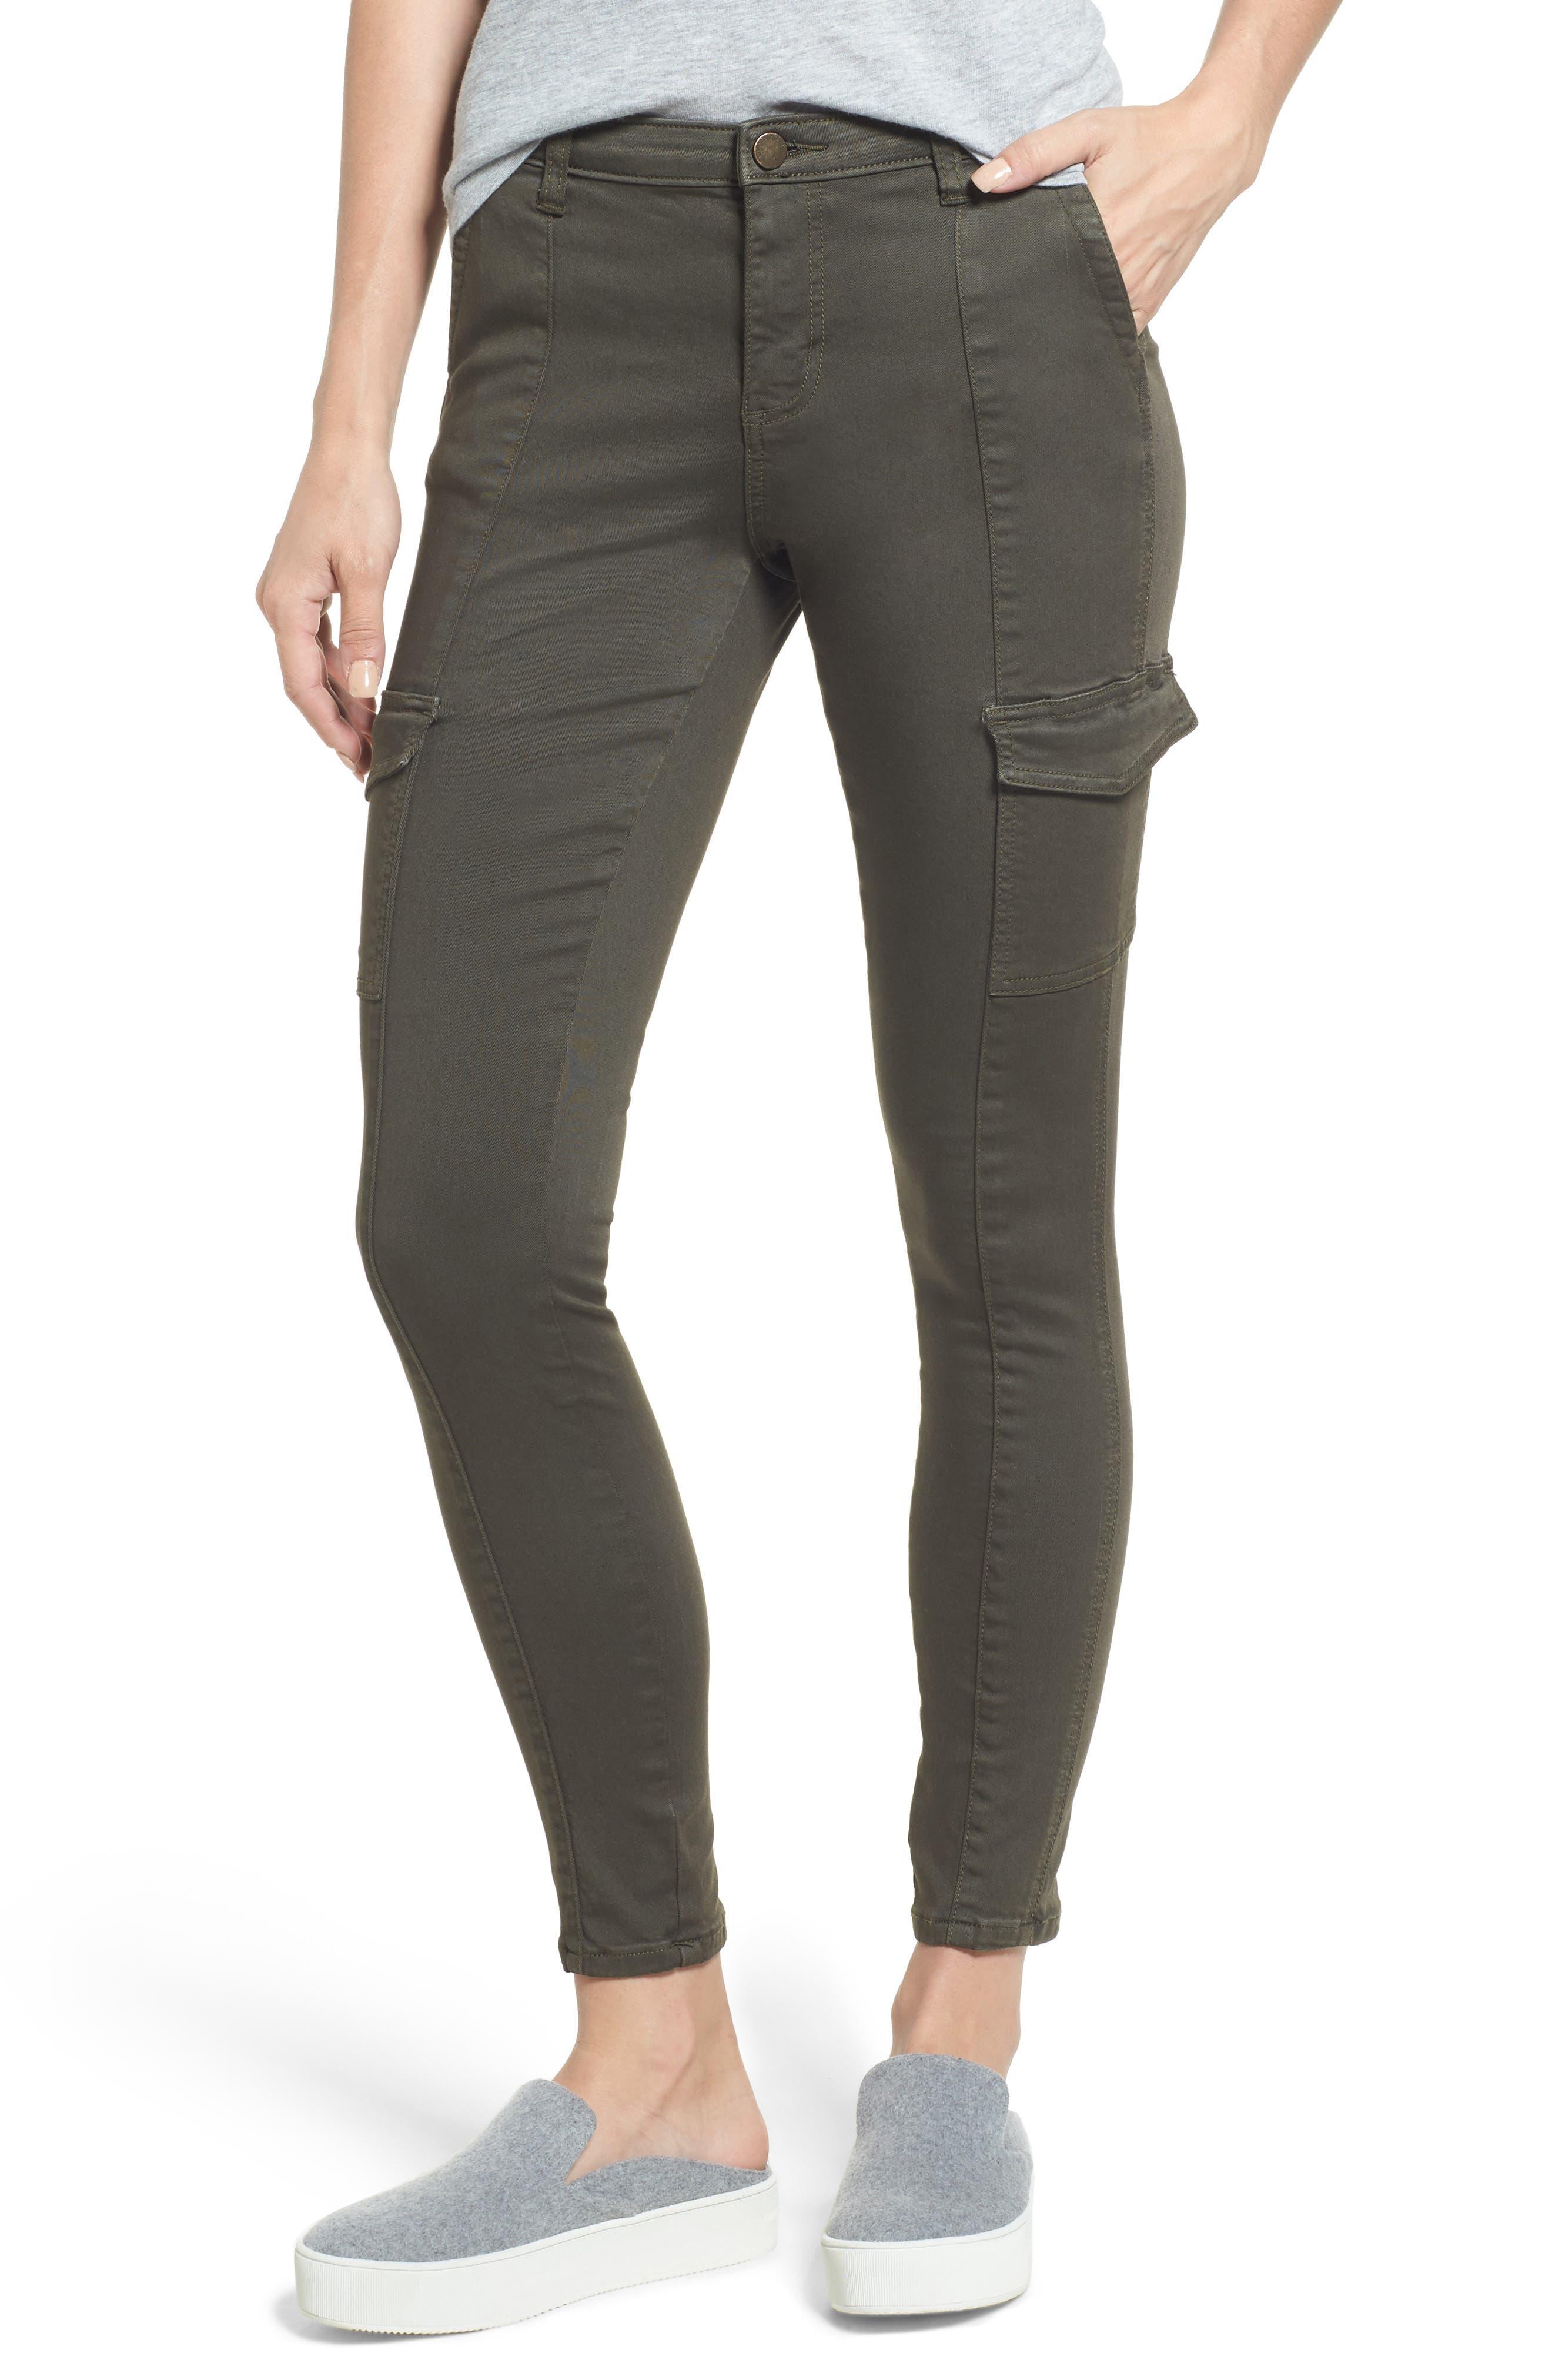 Alternate Image 1 Selected - Caslon® Skinny Cargo Pants (Regular & Petite)